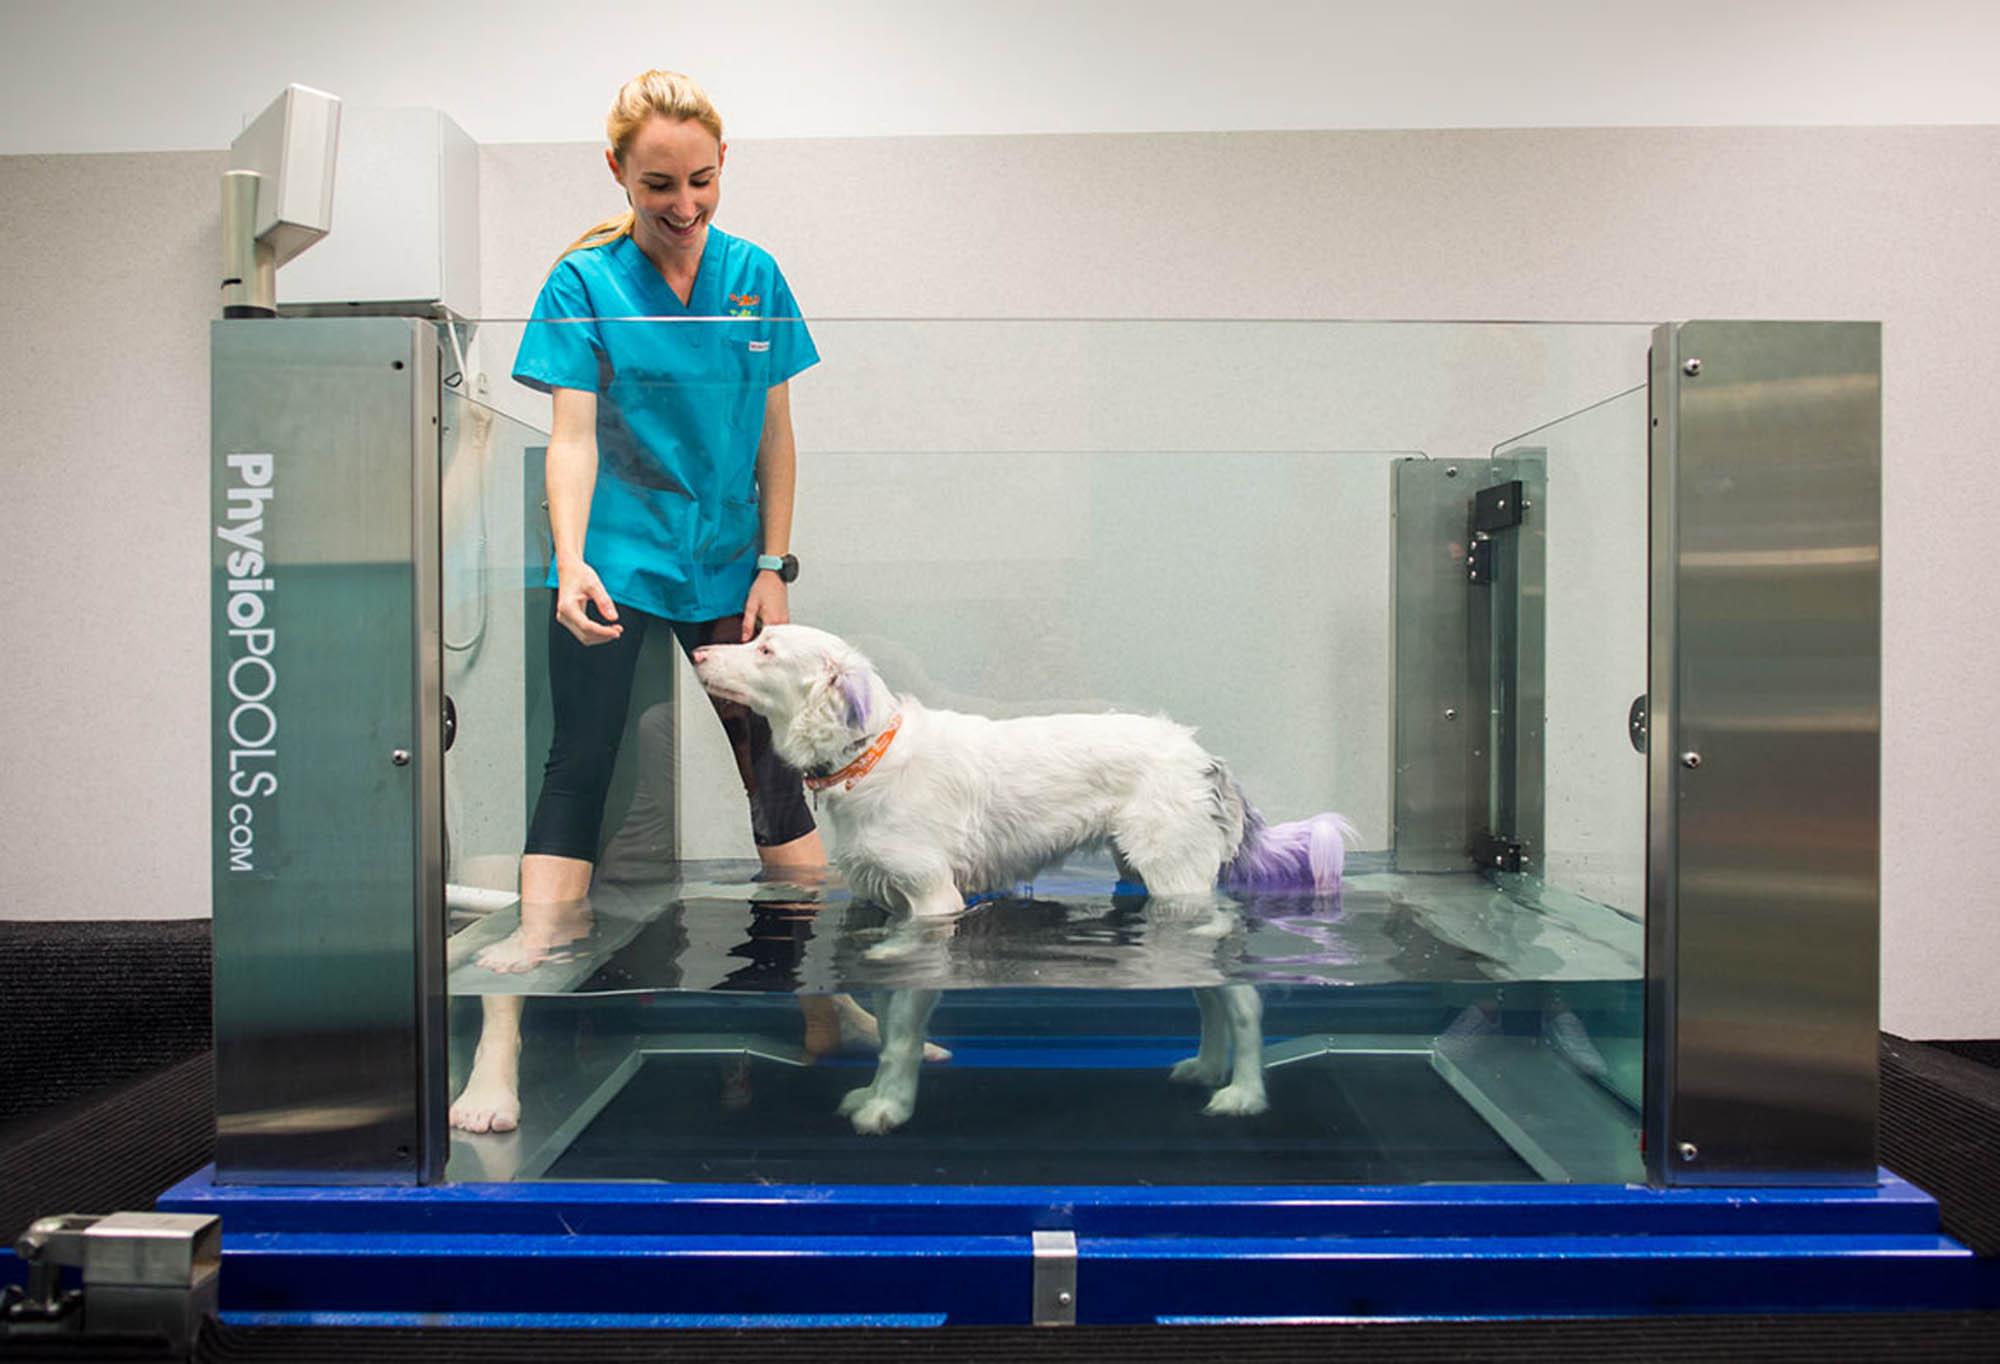 small animal specialist hospital sydney vetinary hospital fitout construction dog pool